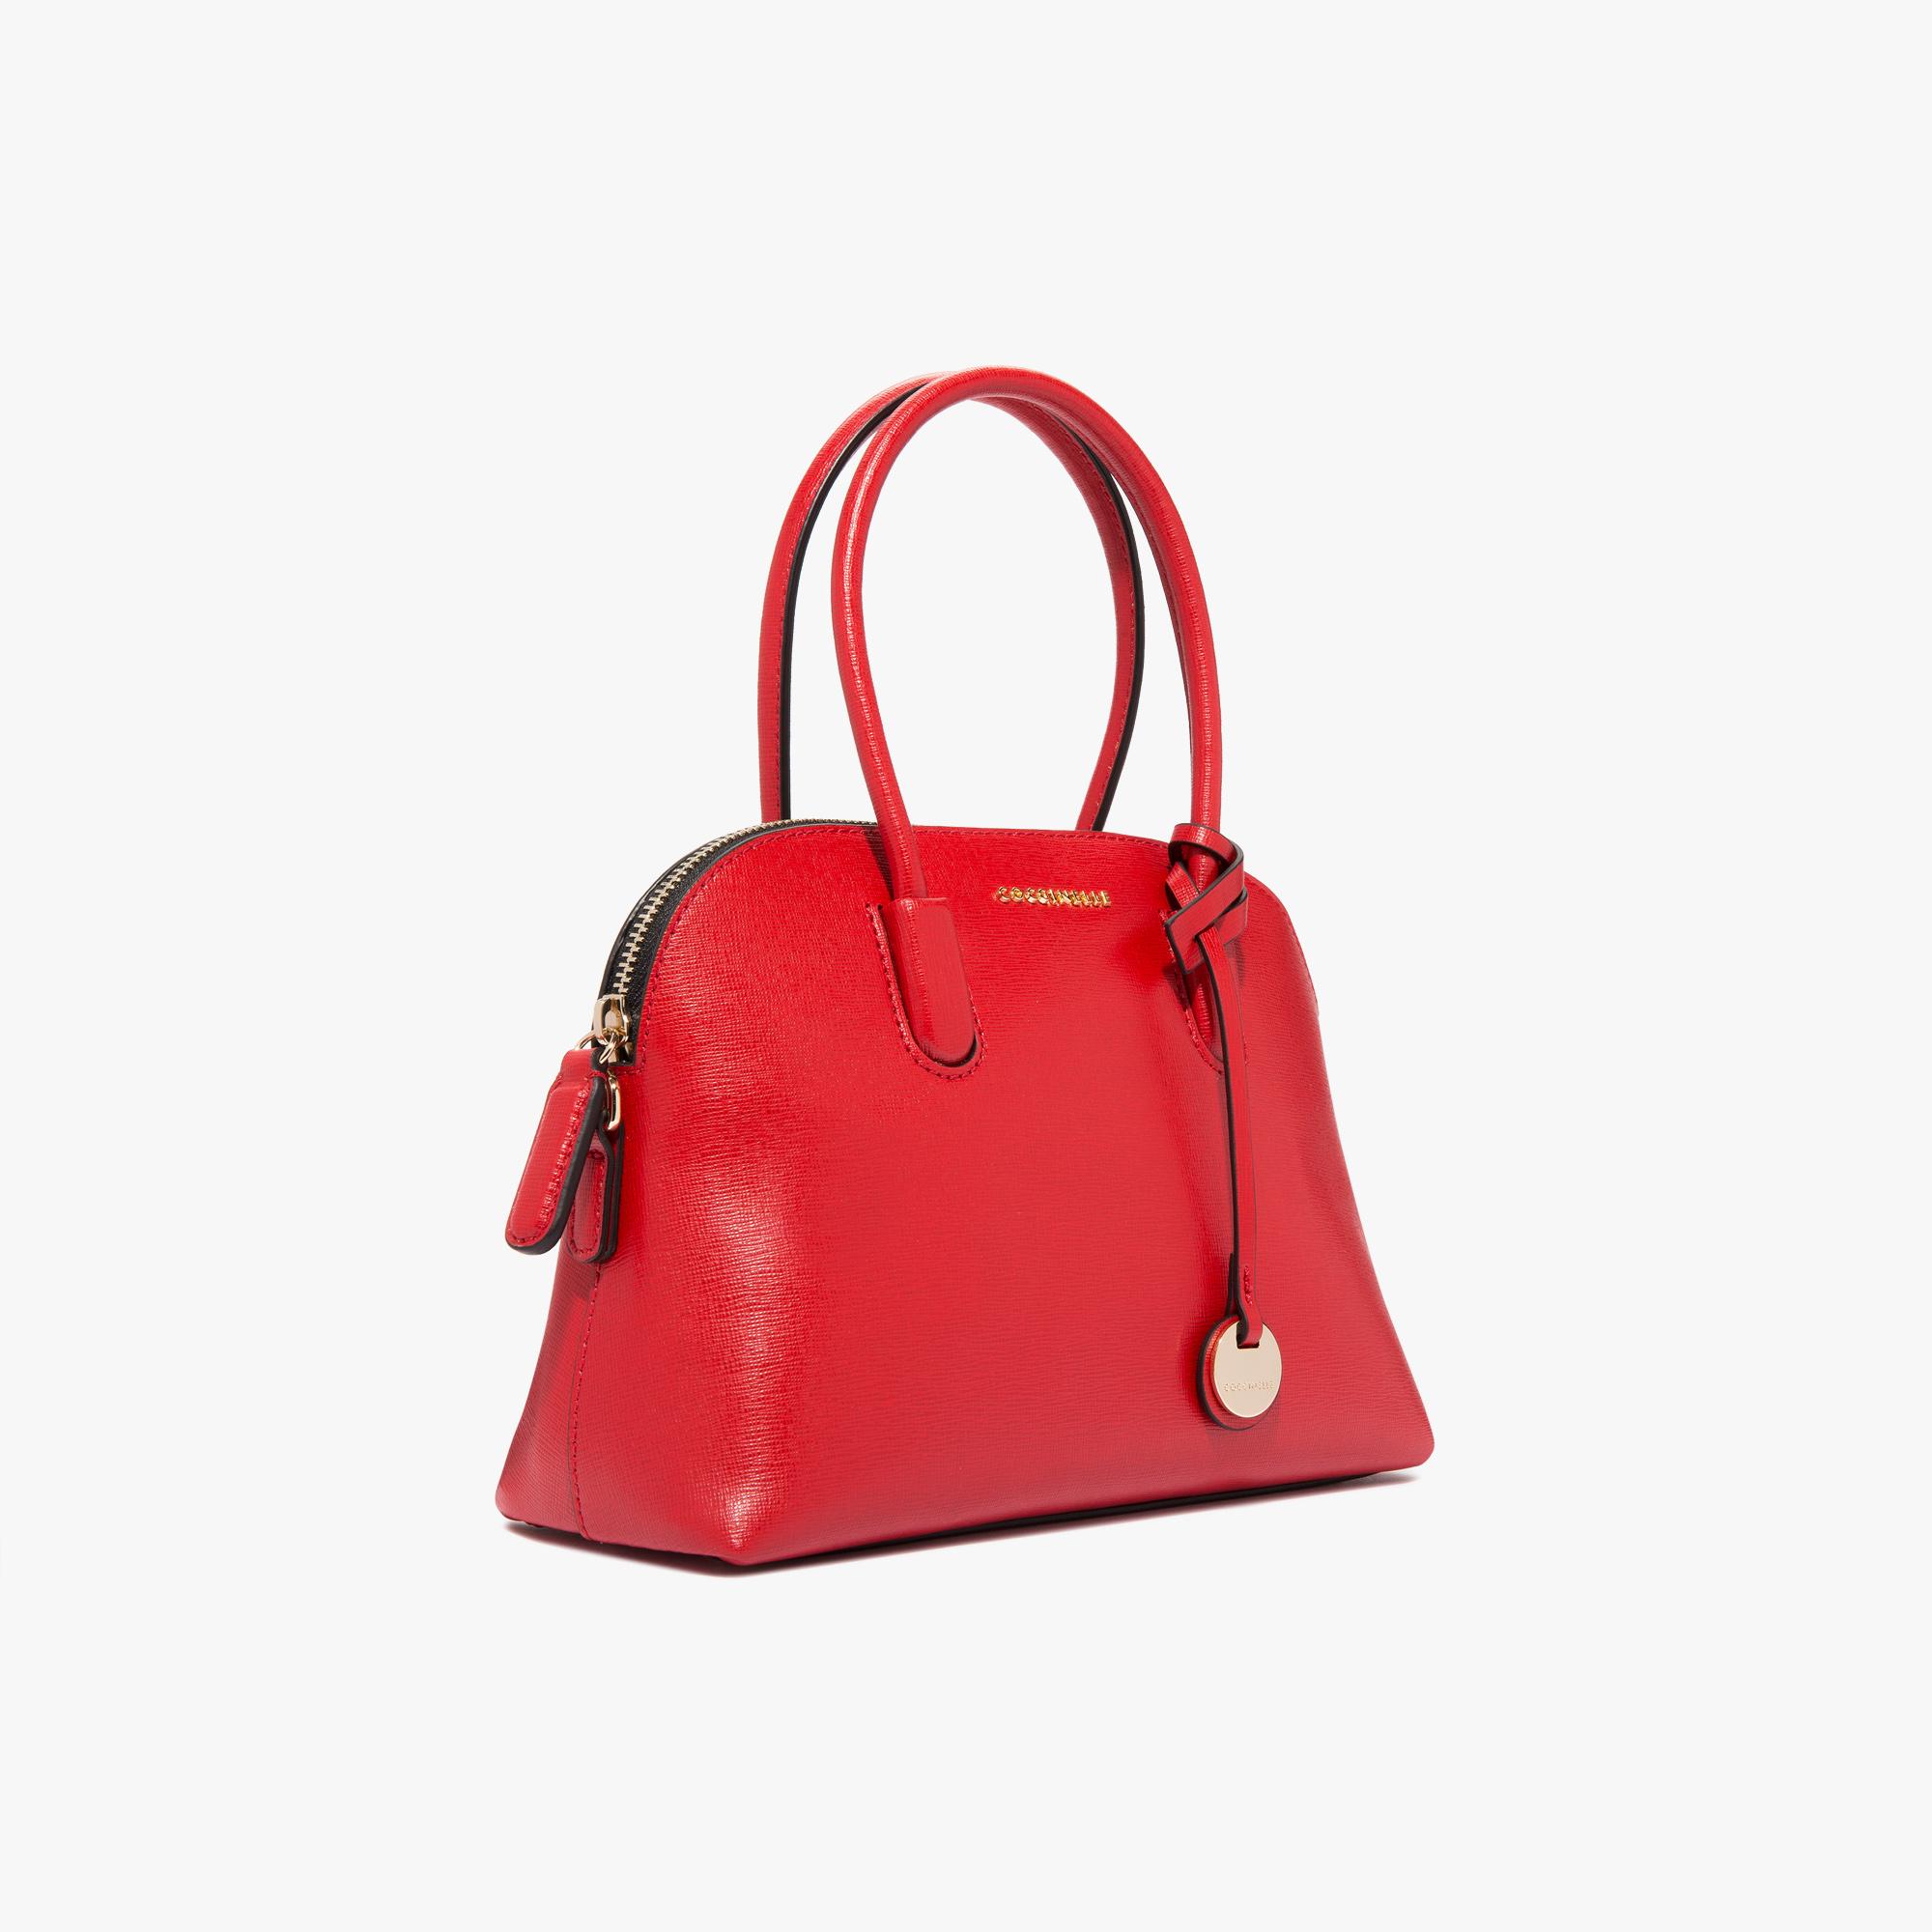 Coccinelle Clementine saffiano handbag